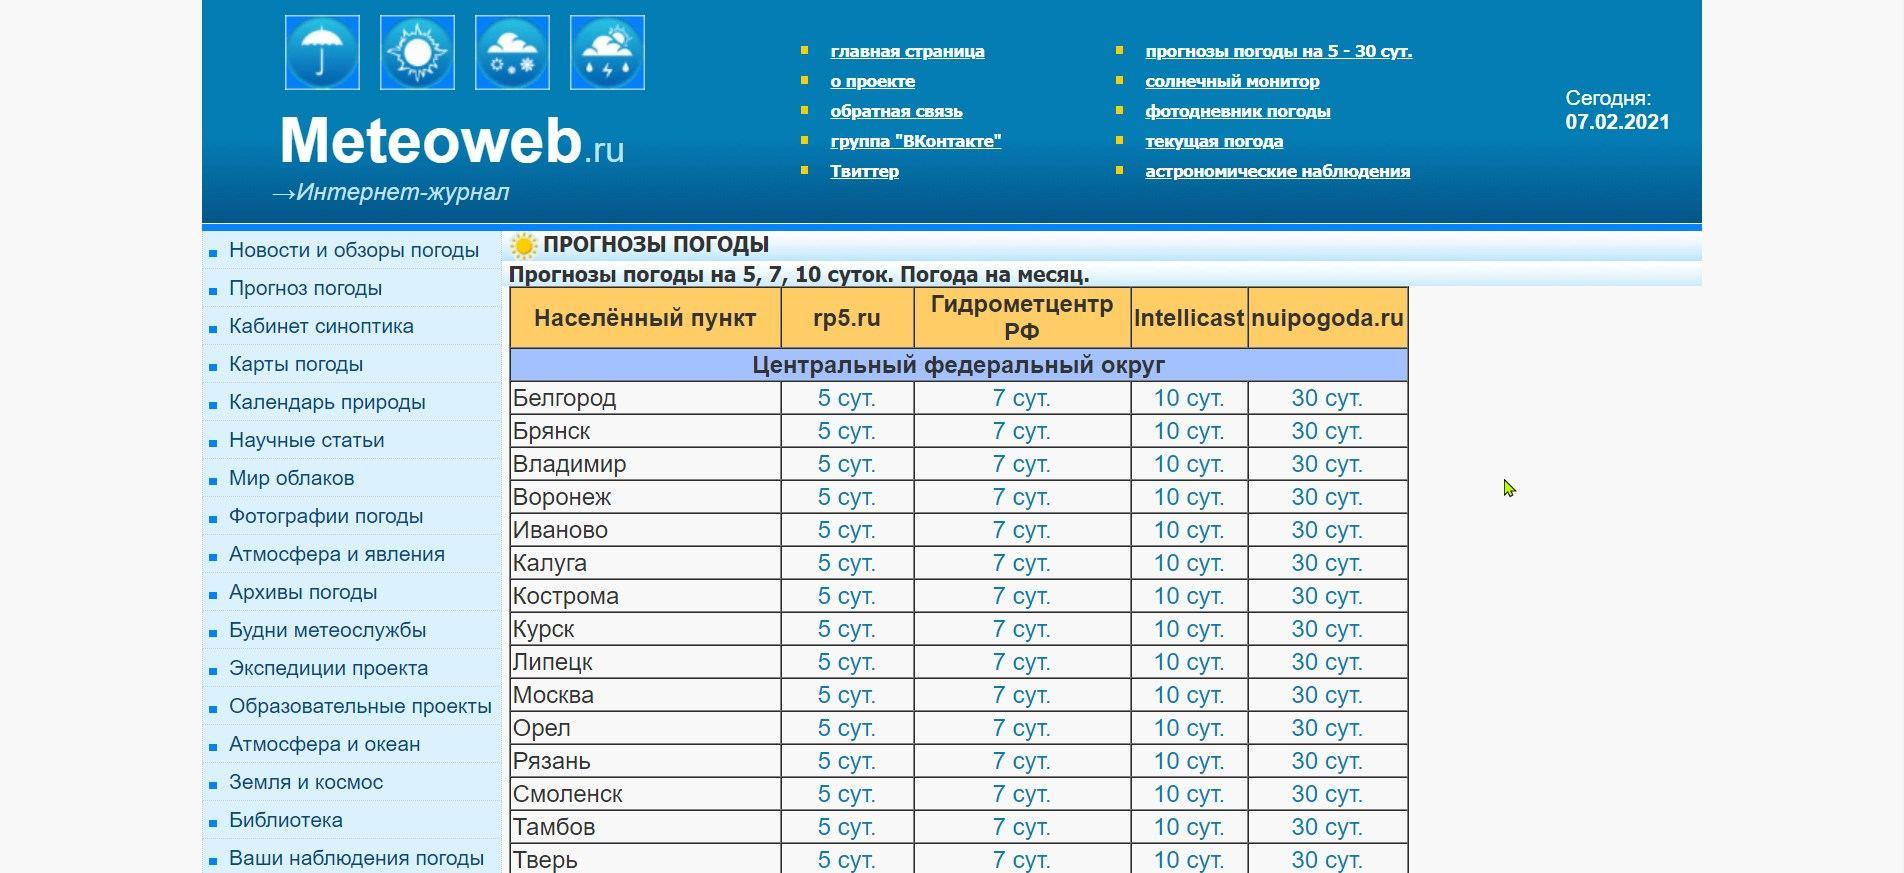 прогносз погоды на 5, 7, 10, на месяц meteoweb.ru